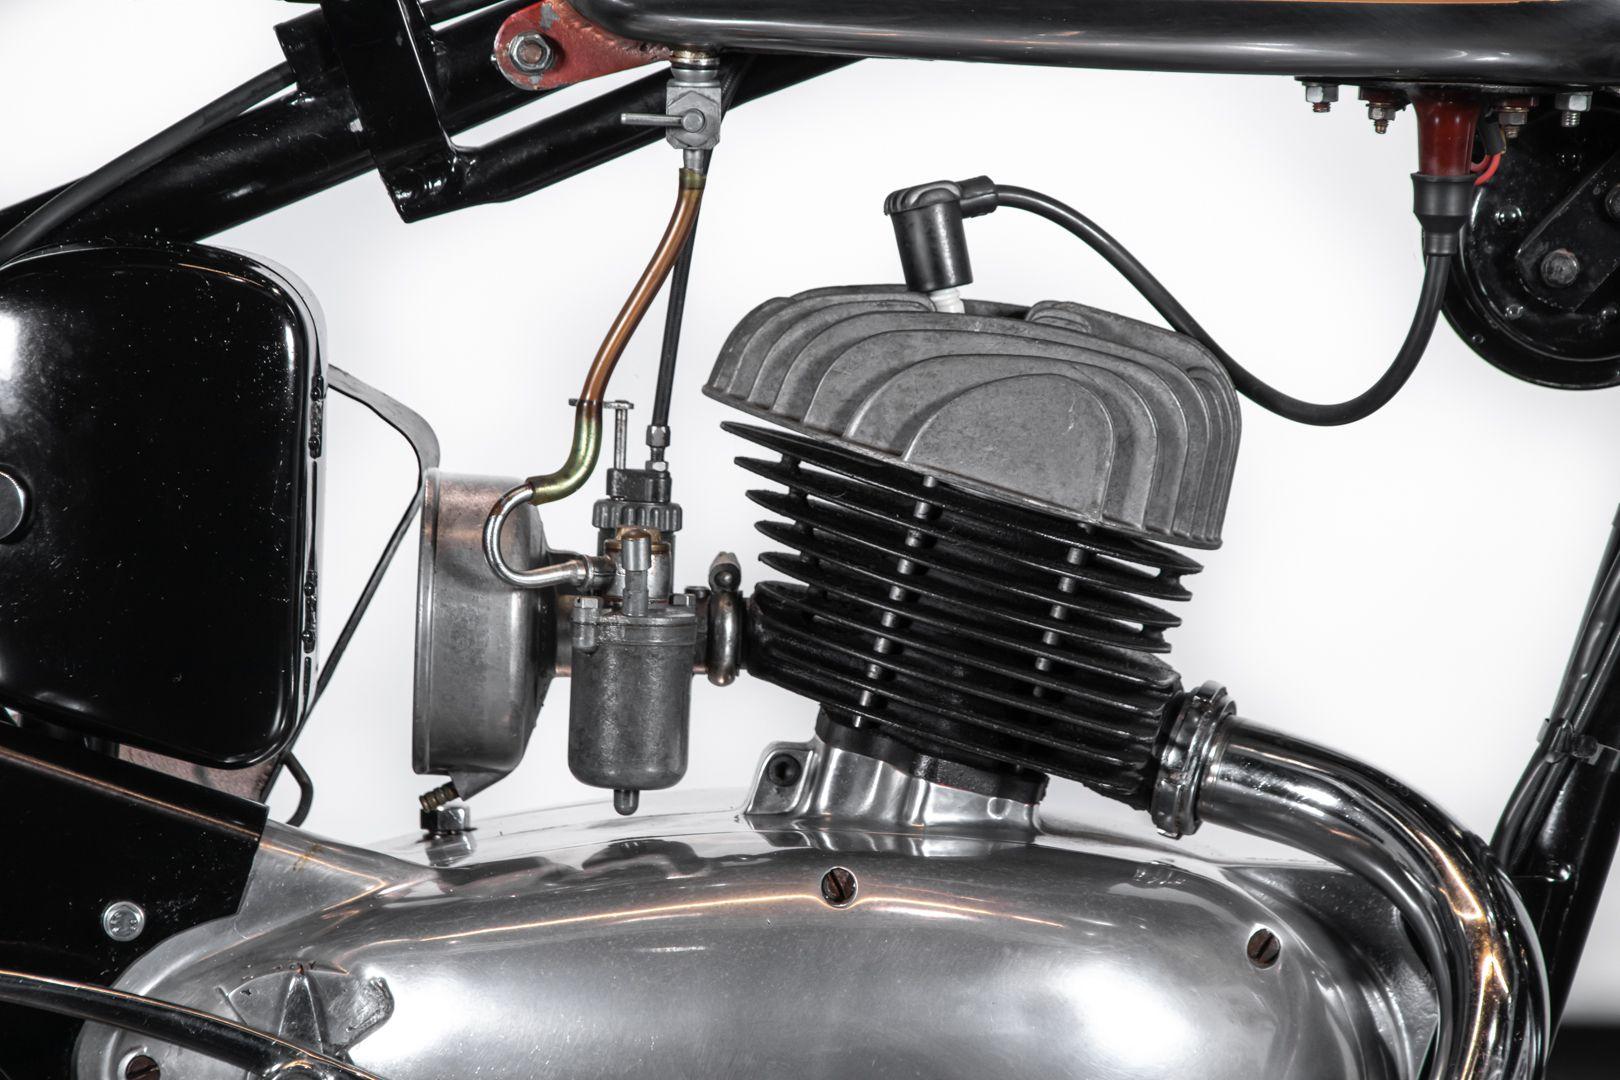 1952 Moto Morini Motore Lungo 2T 125 78775